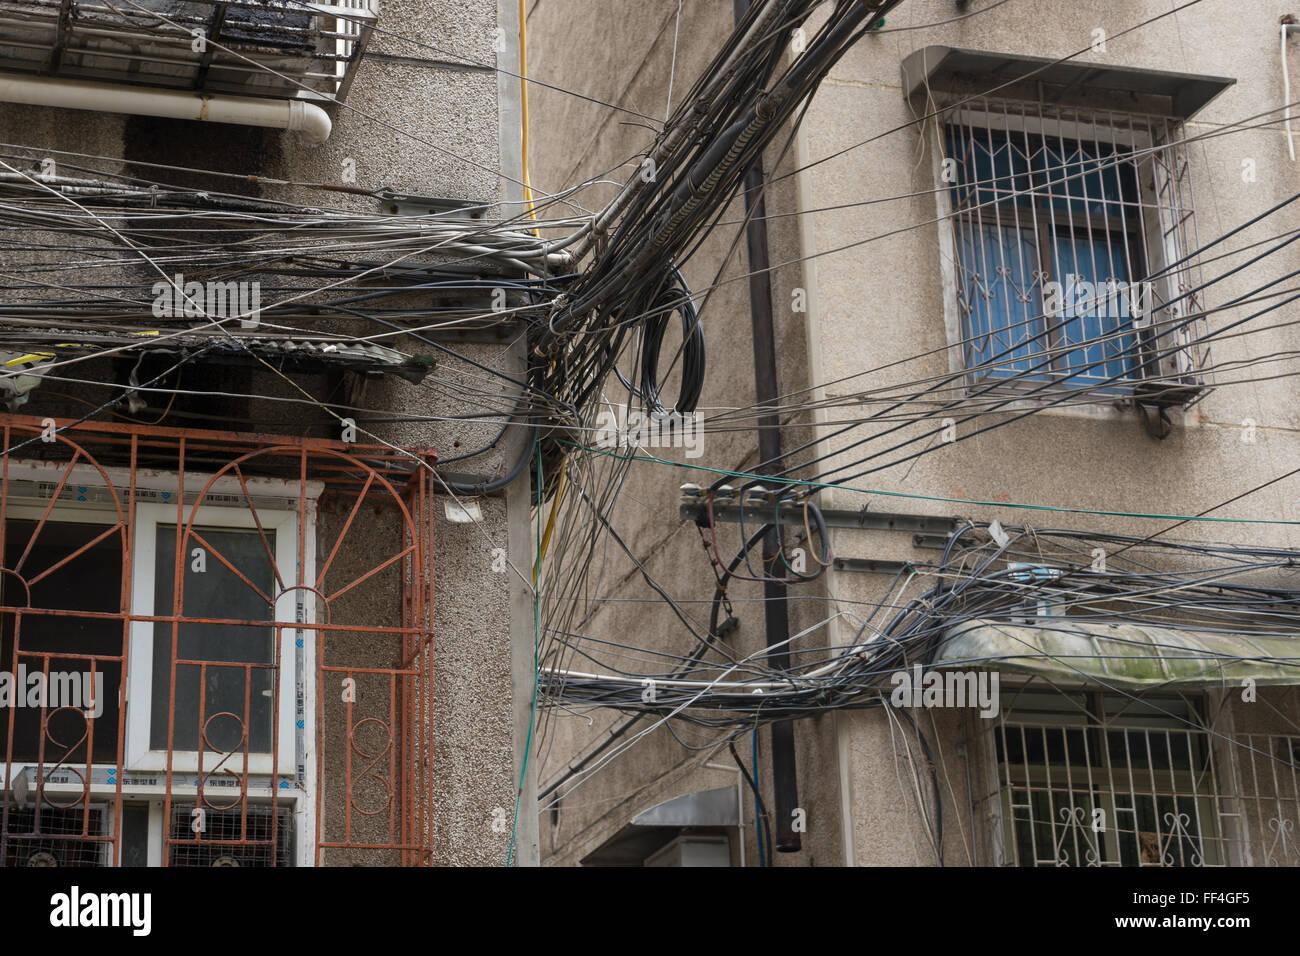 Messy electrical wiring in Xiangtan, Hunan, China - Stock Image